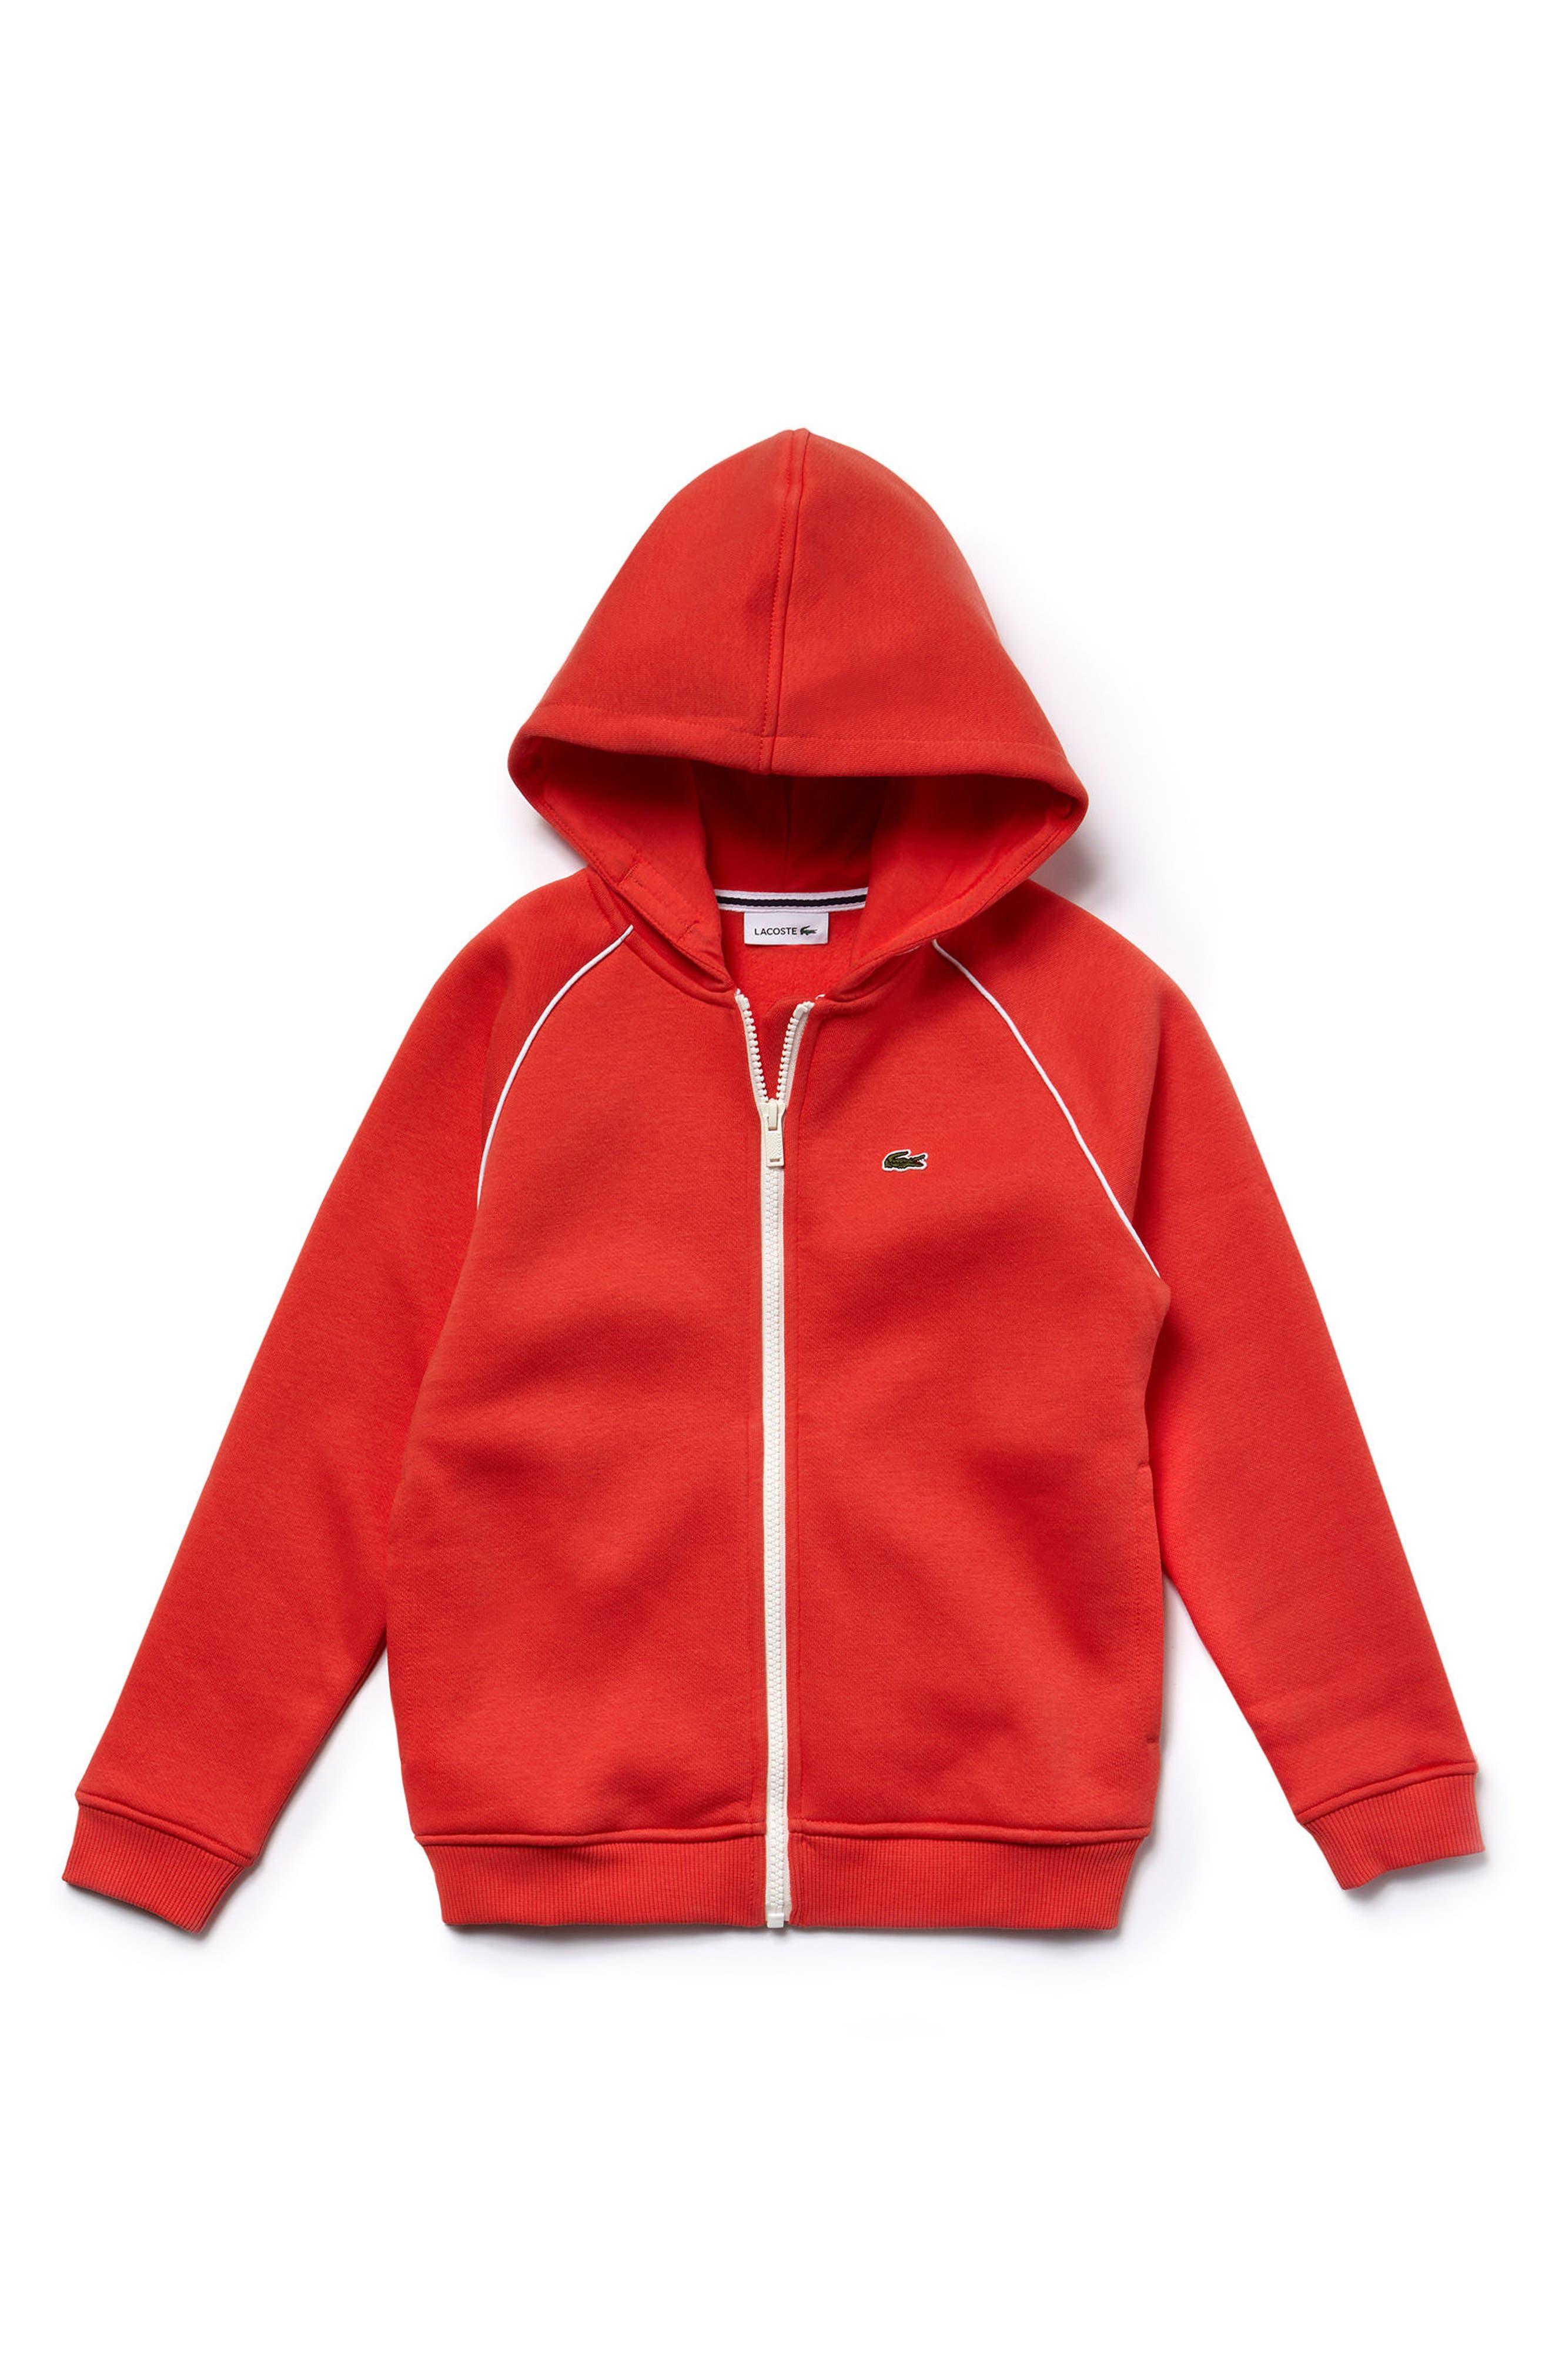 Zip Hoodie,                         Main,                         color, Watermelon Orange/ White